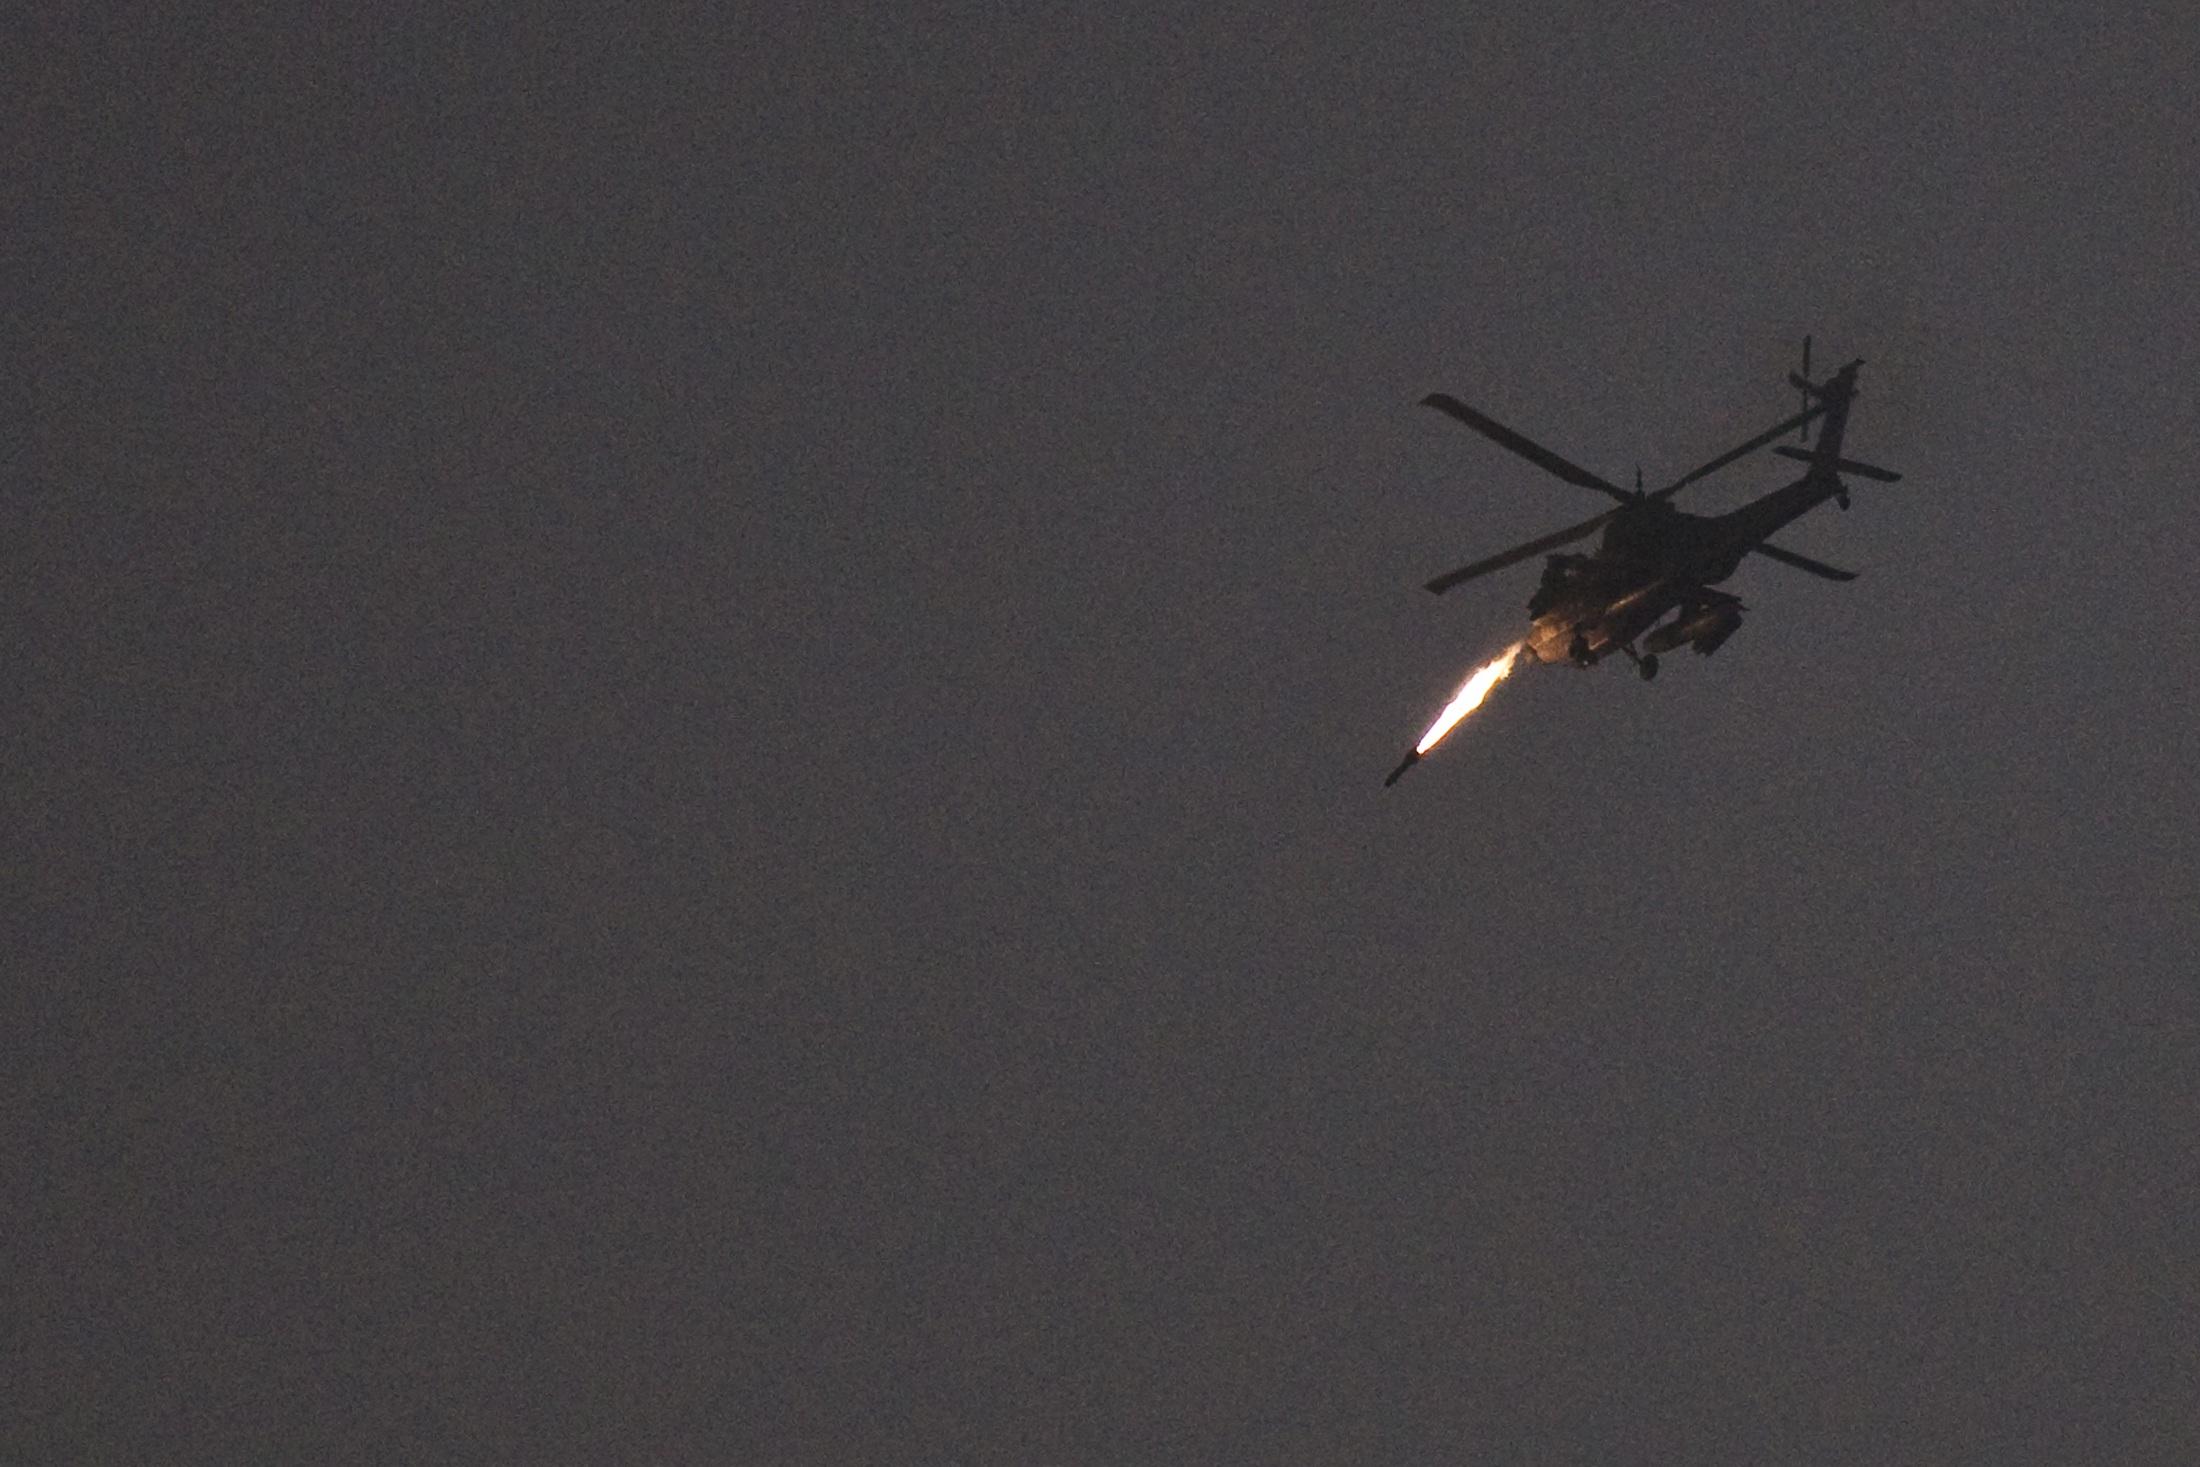 Airlines cancel Israel flights over Gaza rocket threat